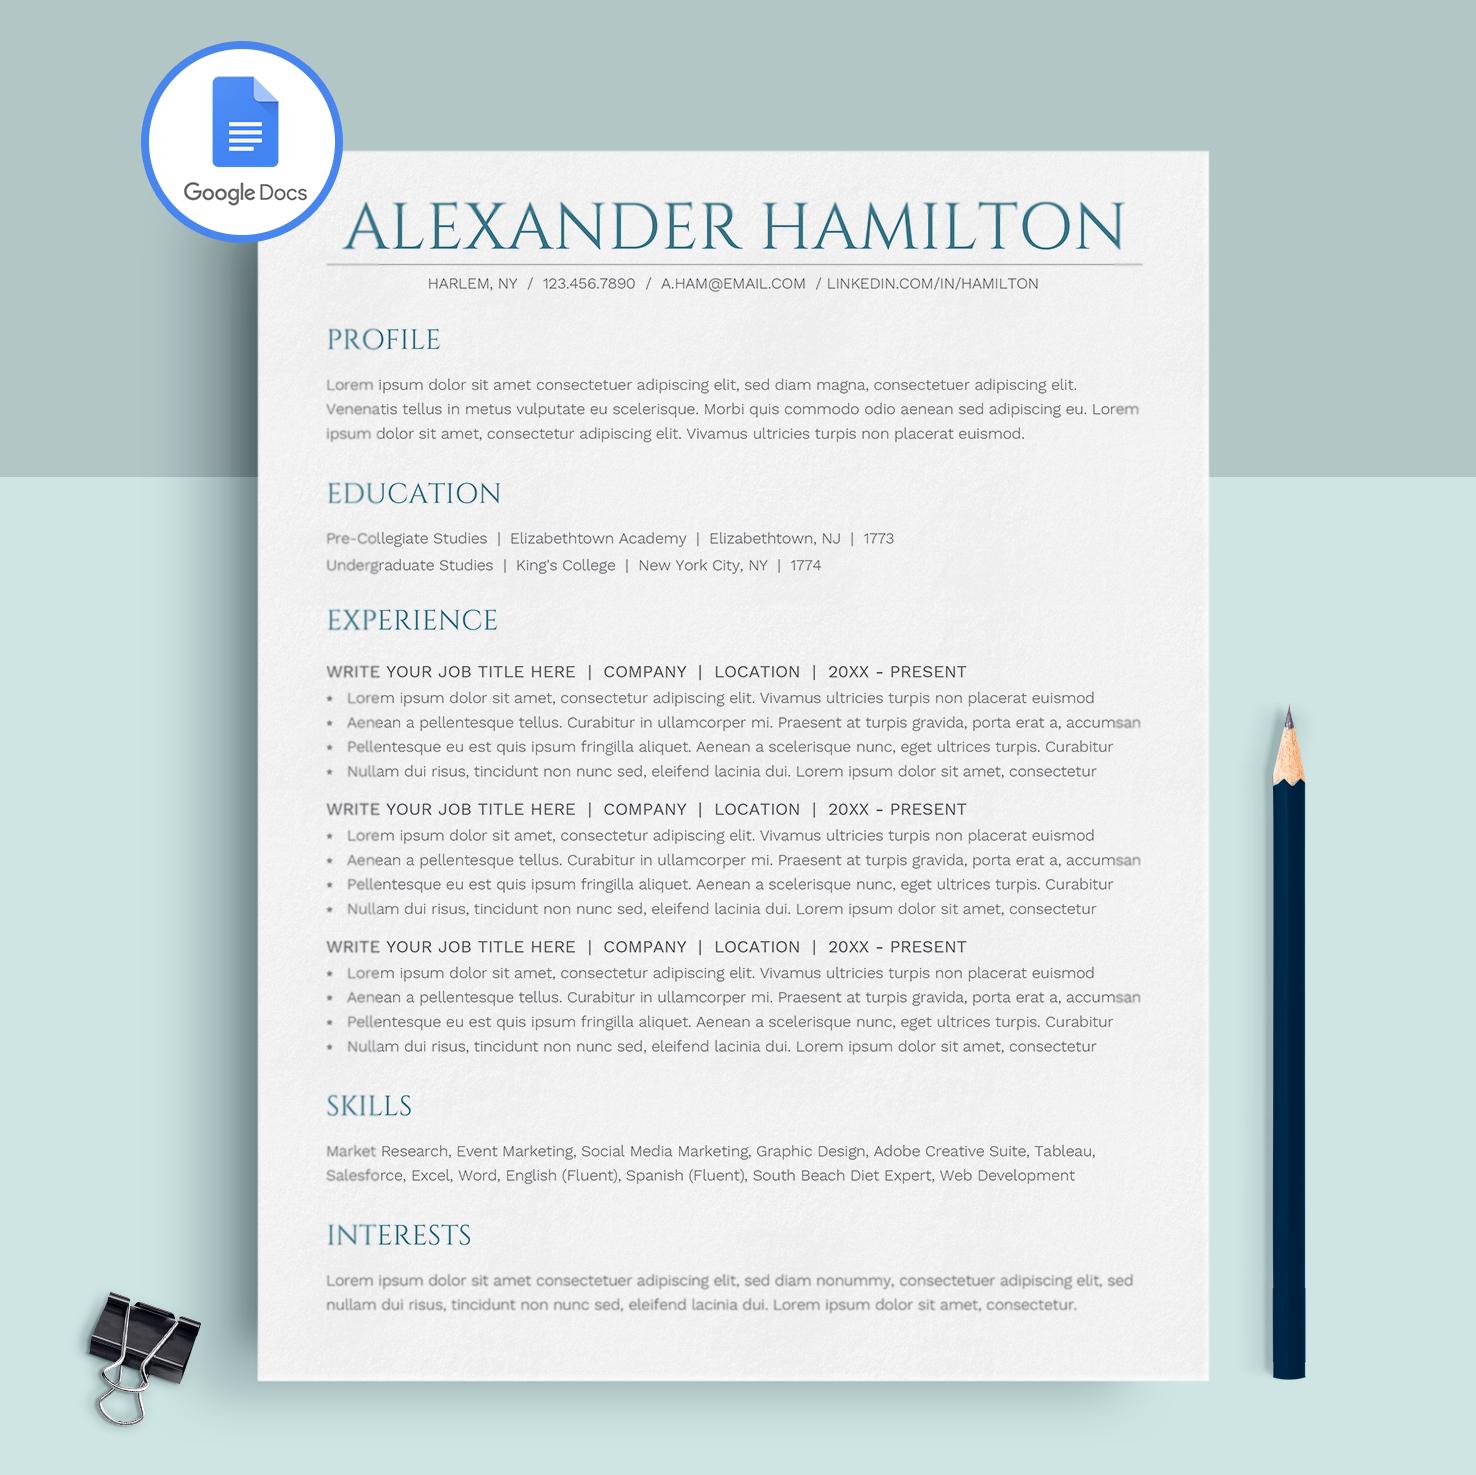 Alexander Hamilton Google Docs Resume Template CV